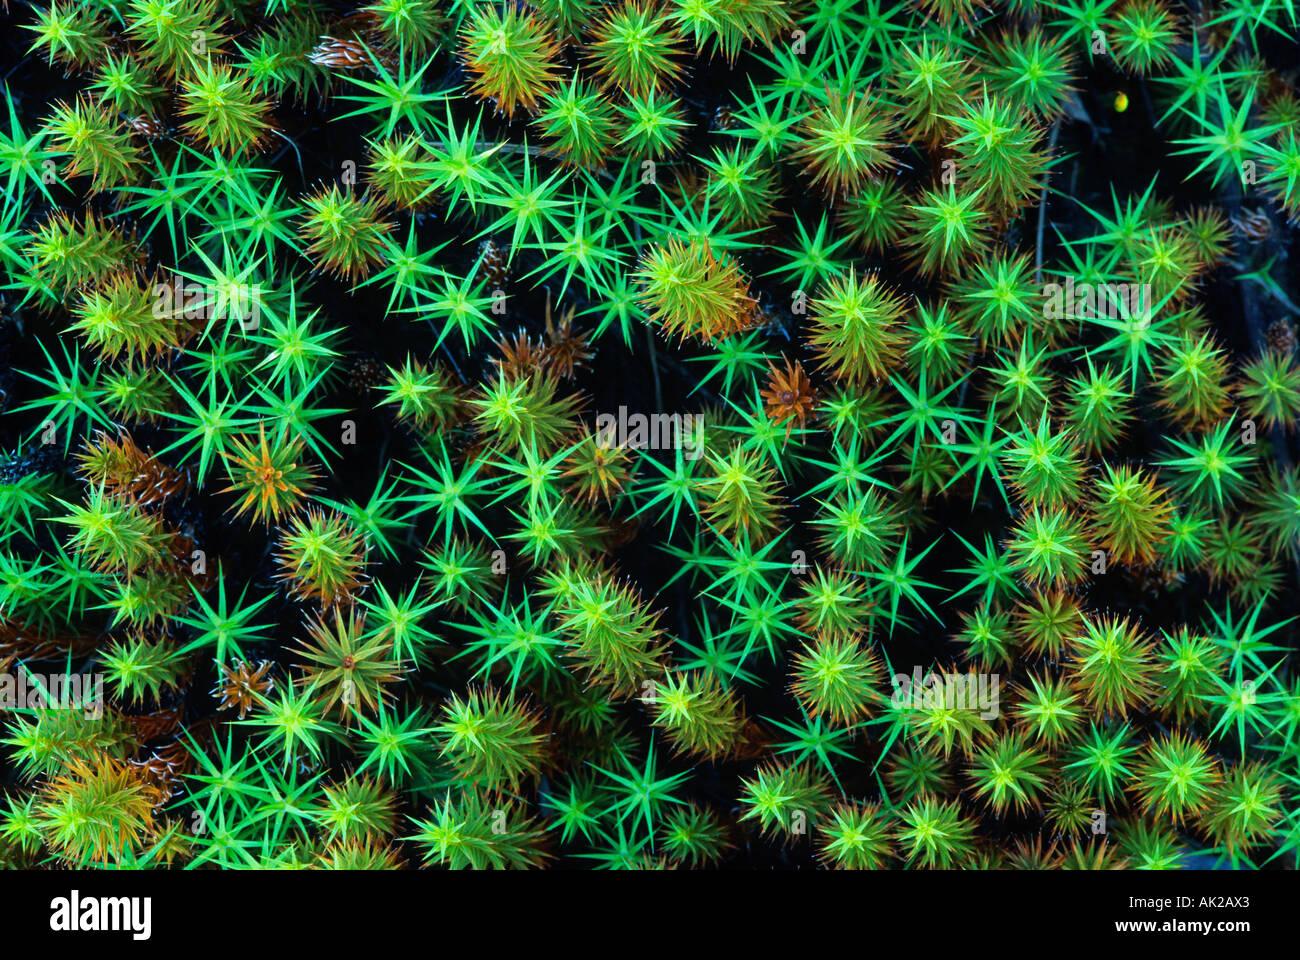 Green asterisks - Stock Image